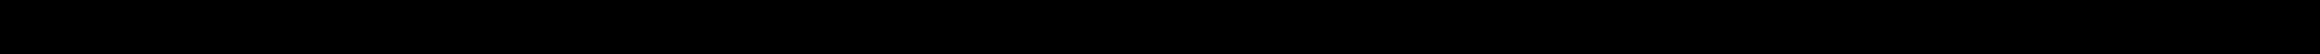 PHILIPS 0233354-0, X825 283 299 000, 4198674A, 1089.0365.01, 1813000005 Lemputė, indikatorius